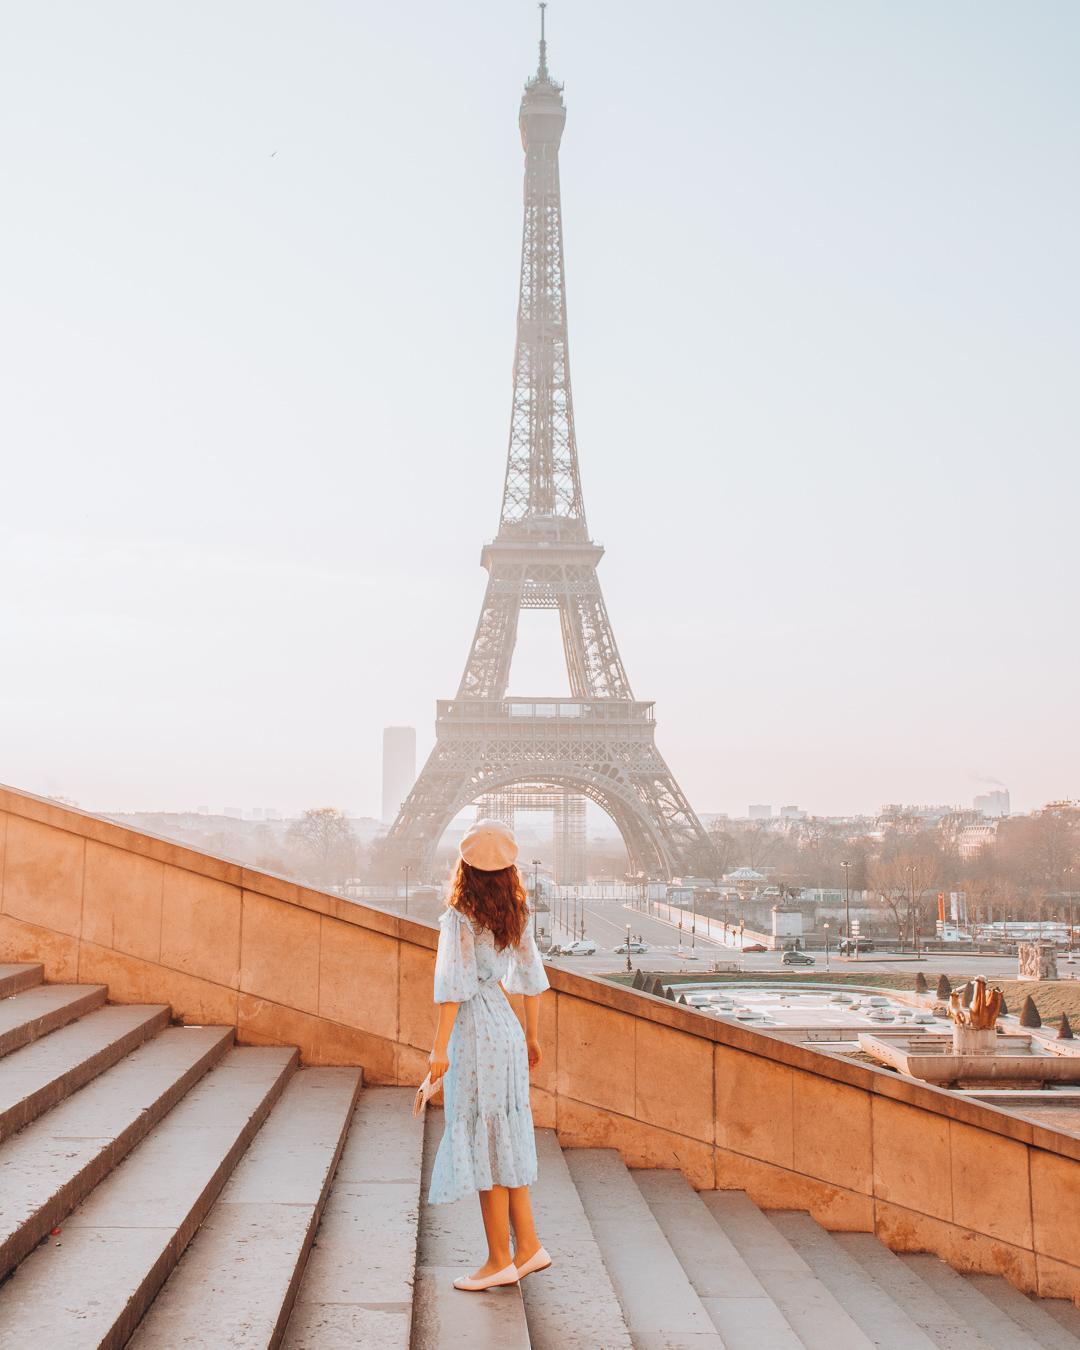 Eiffel Tower at steps of Trocadéro